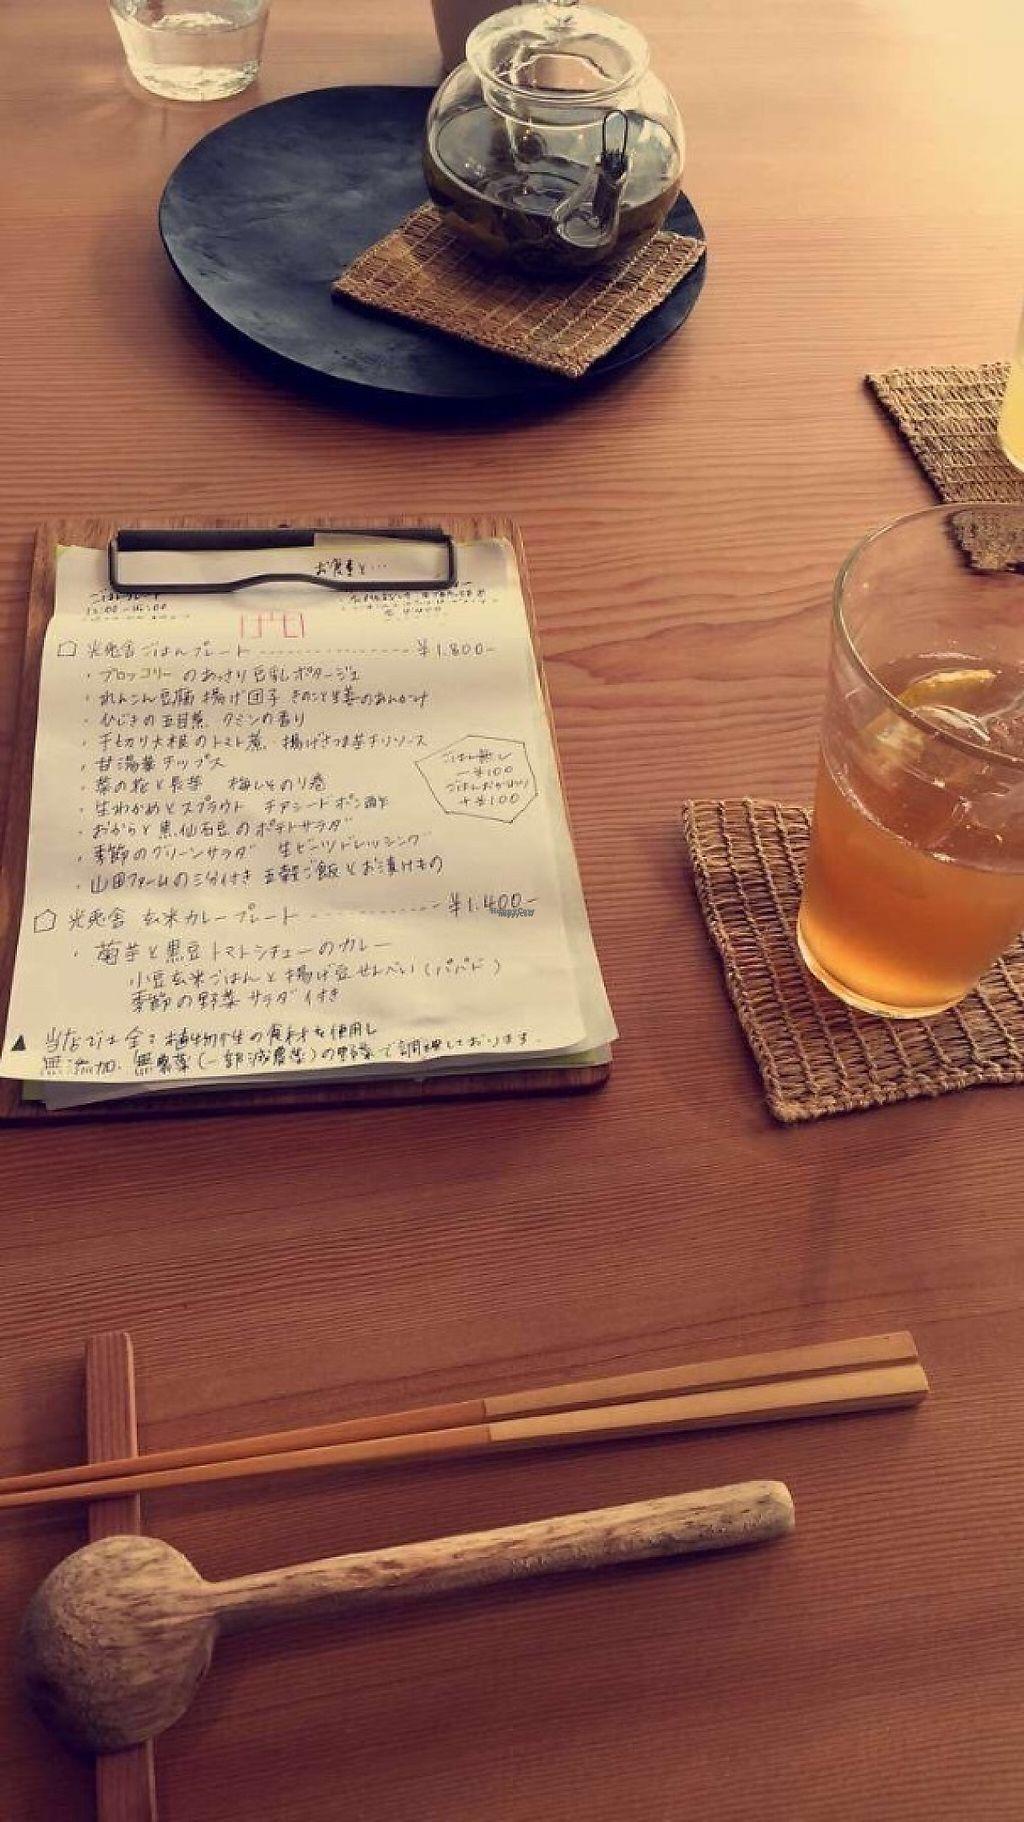 "Photo of Kousagisha Cafe  by <a href=""/members/profile/PaulaKollienGjerde"">PaulaKollienGjerde</a> <br/>Menu <br/> April 13, 2017  - <a href='/contact/abuse/image/82027/247498'>Report</a>"